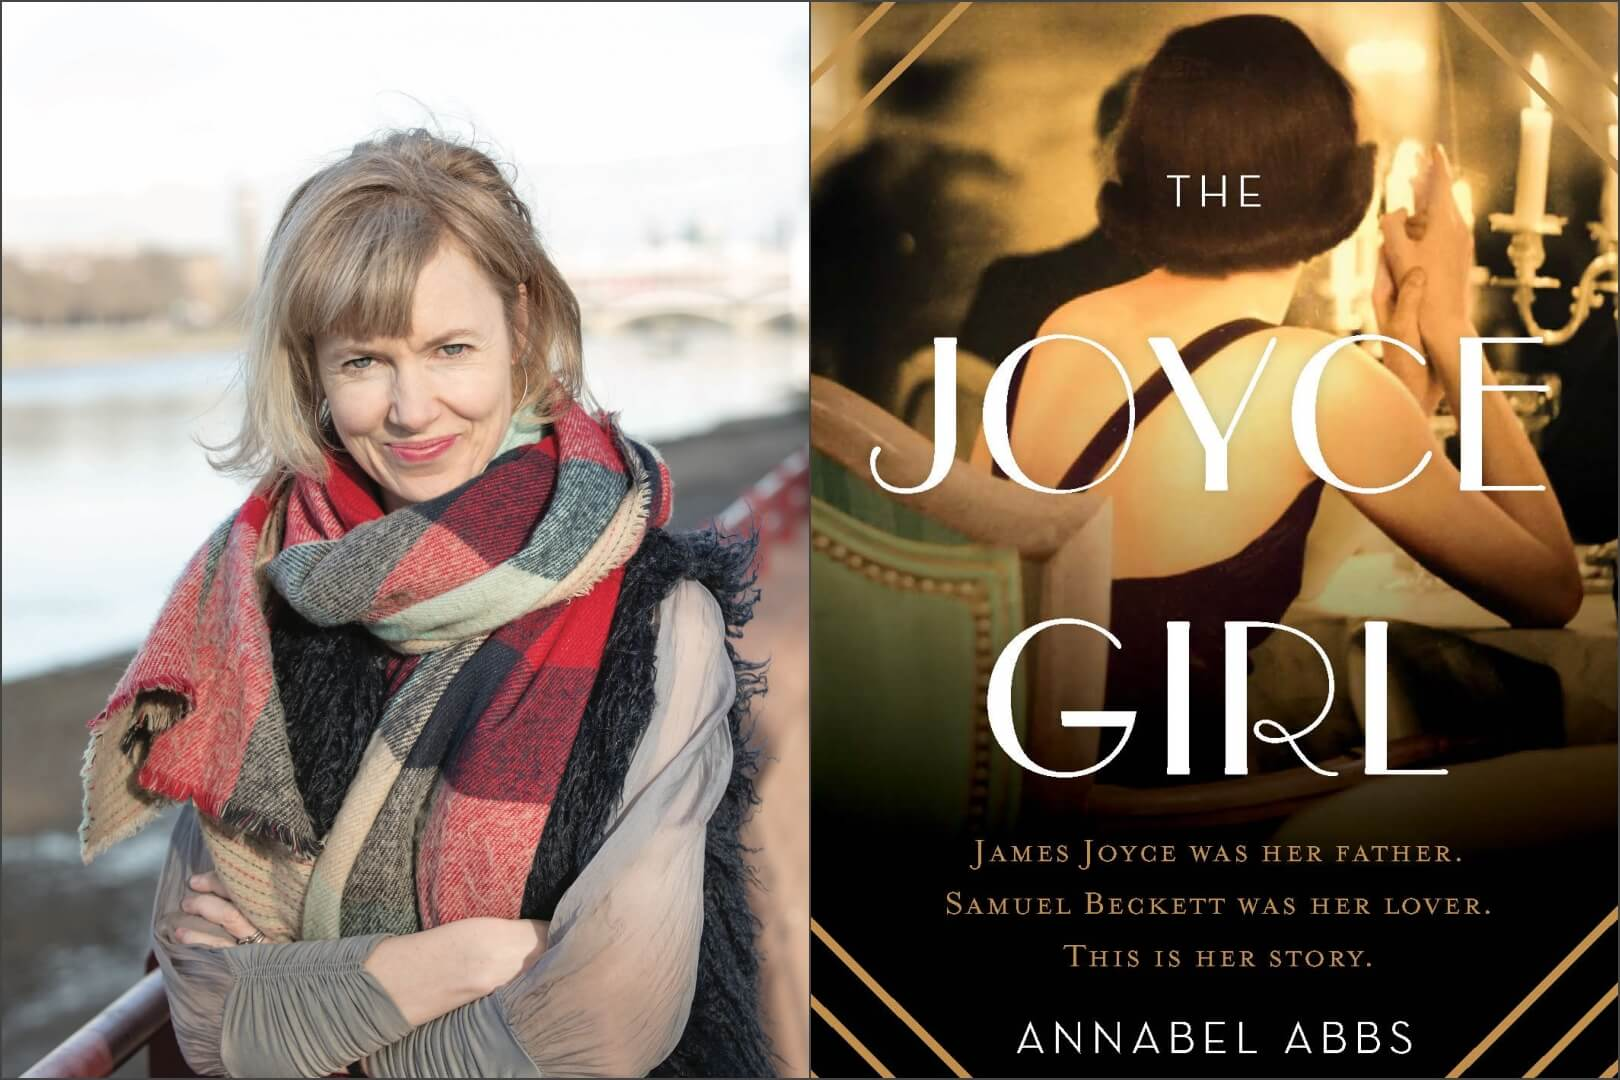 annabel abbs interview - book club chat